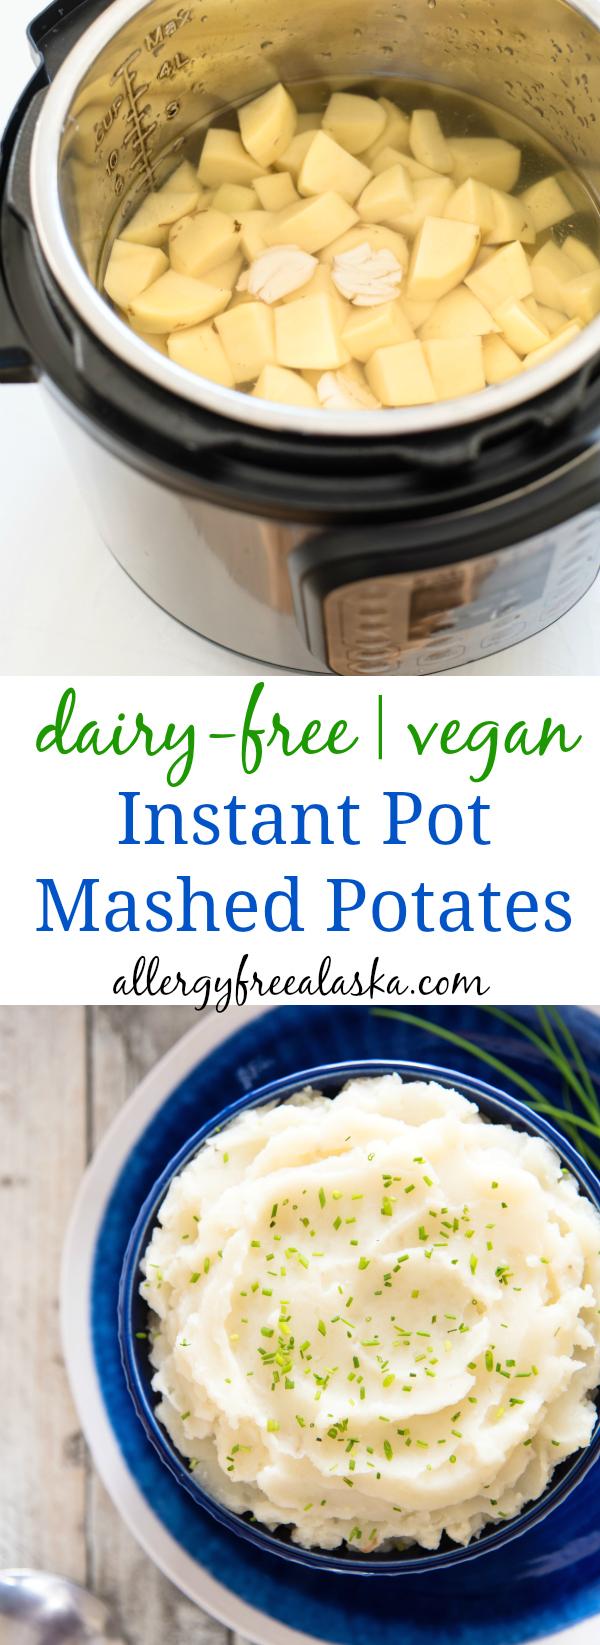 dairy free instant pot mashed potatoes allergy free alaska